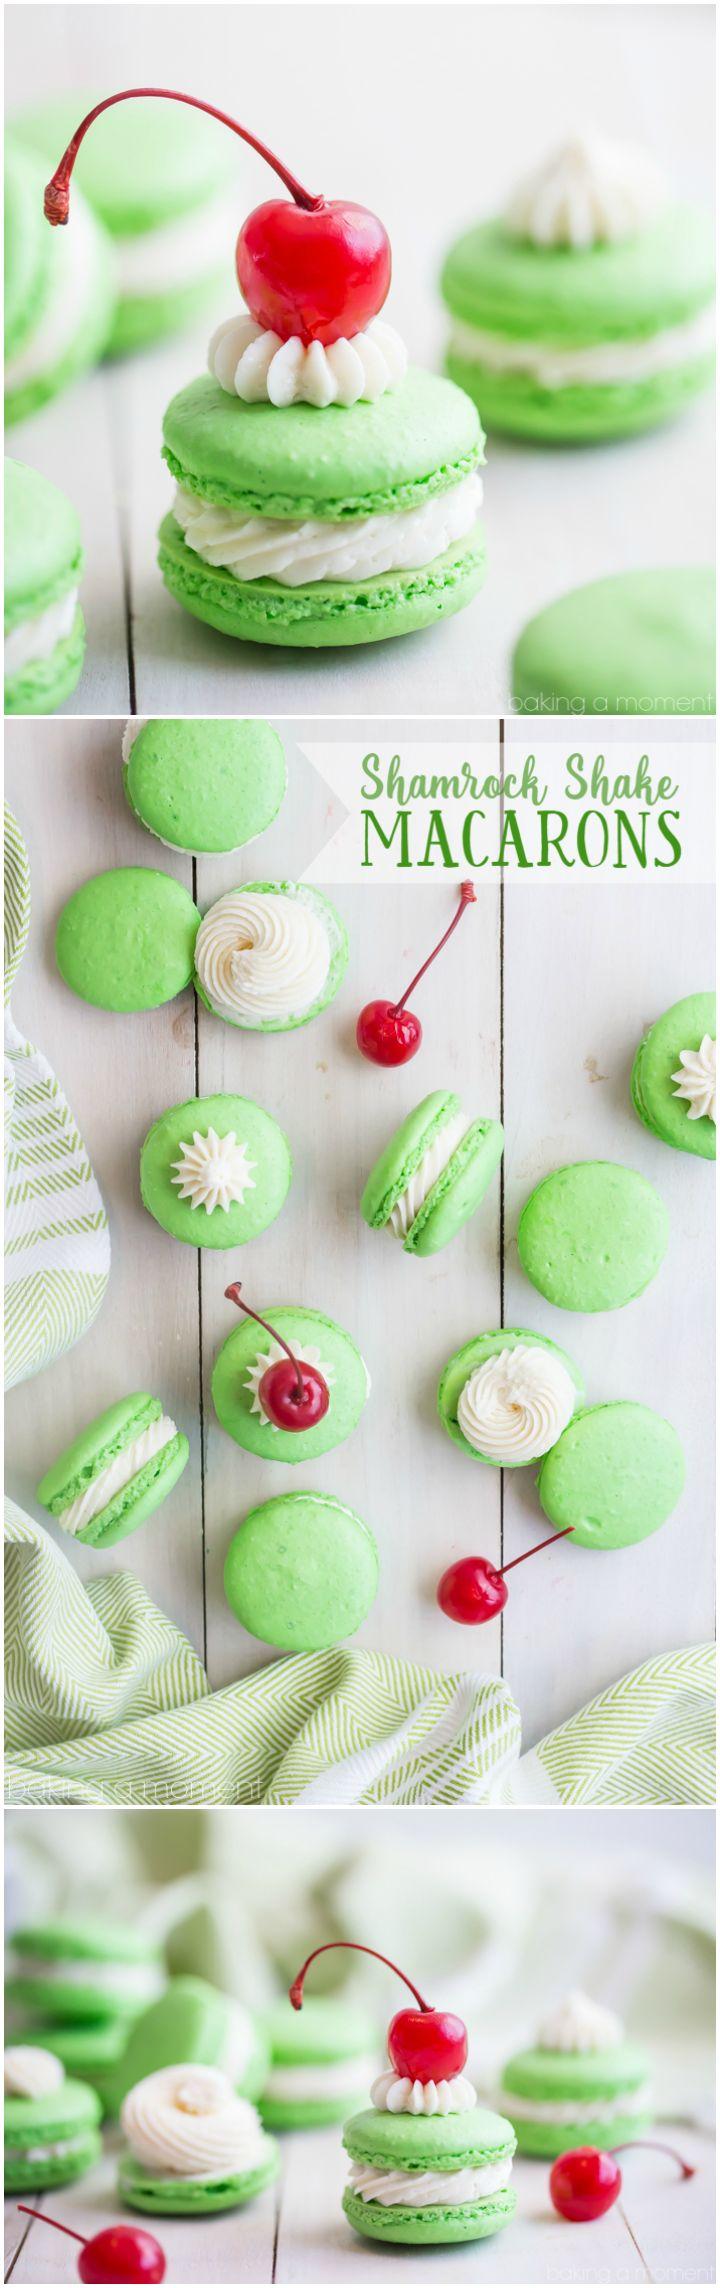 Shamrock Shake Macarons! So much fun for St. Patrick's Day! @bakingamoment #green #Irish #TACOboutTLEG